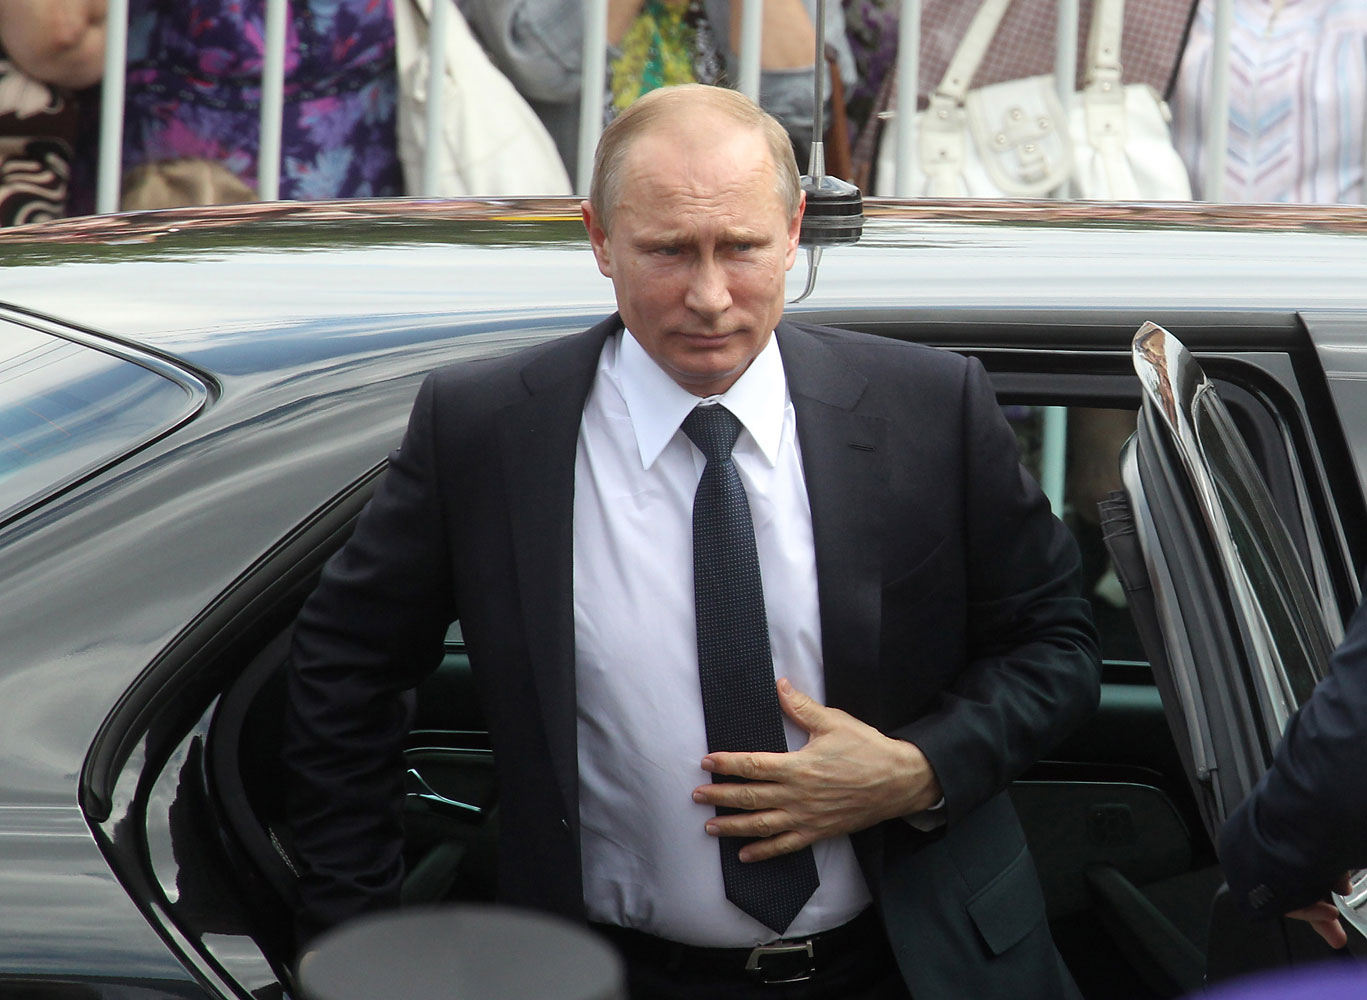 Russian President Vladimir Putin arrives for the Orthodox festival to honour the birthday of Venerable Sergius of Radonezh in the Trinity Lavra of St.Sergius on July 18, 2014, in Sergiyev Posad.